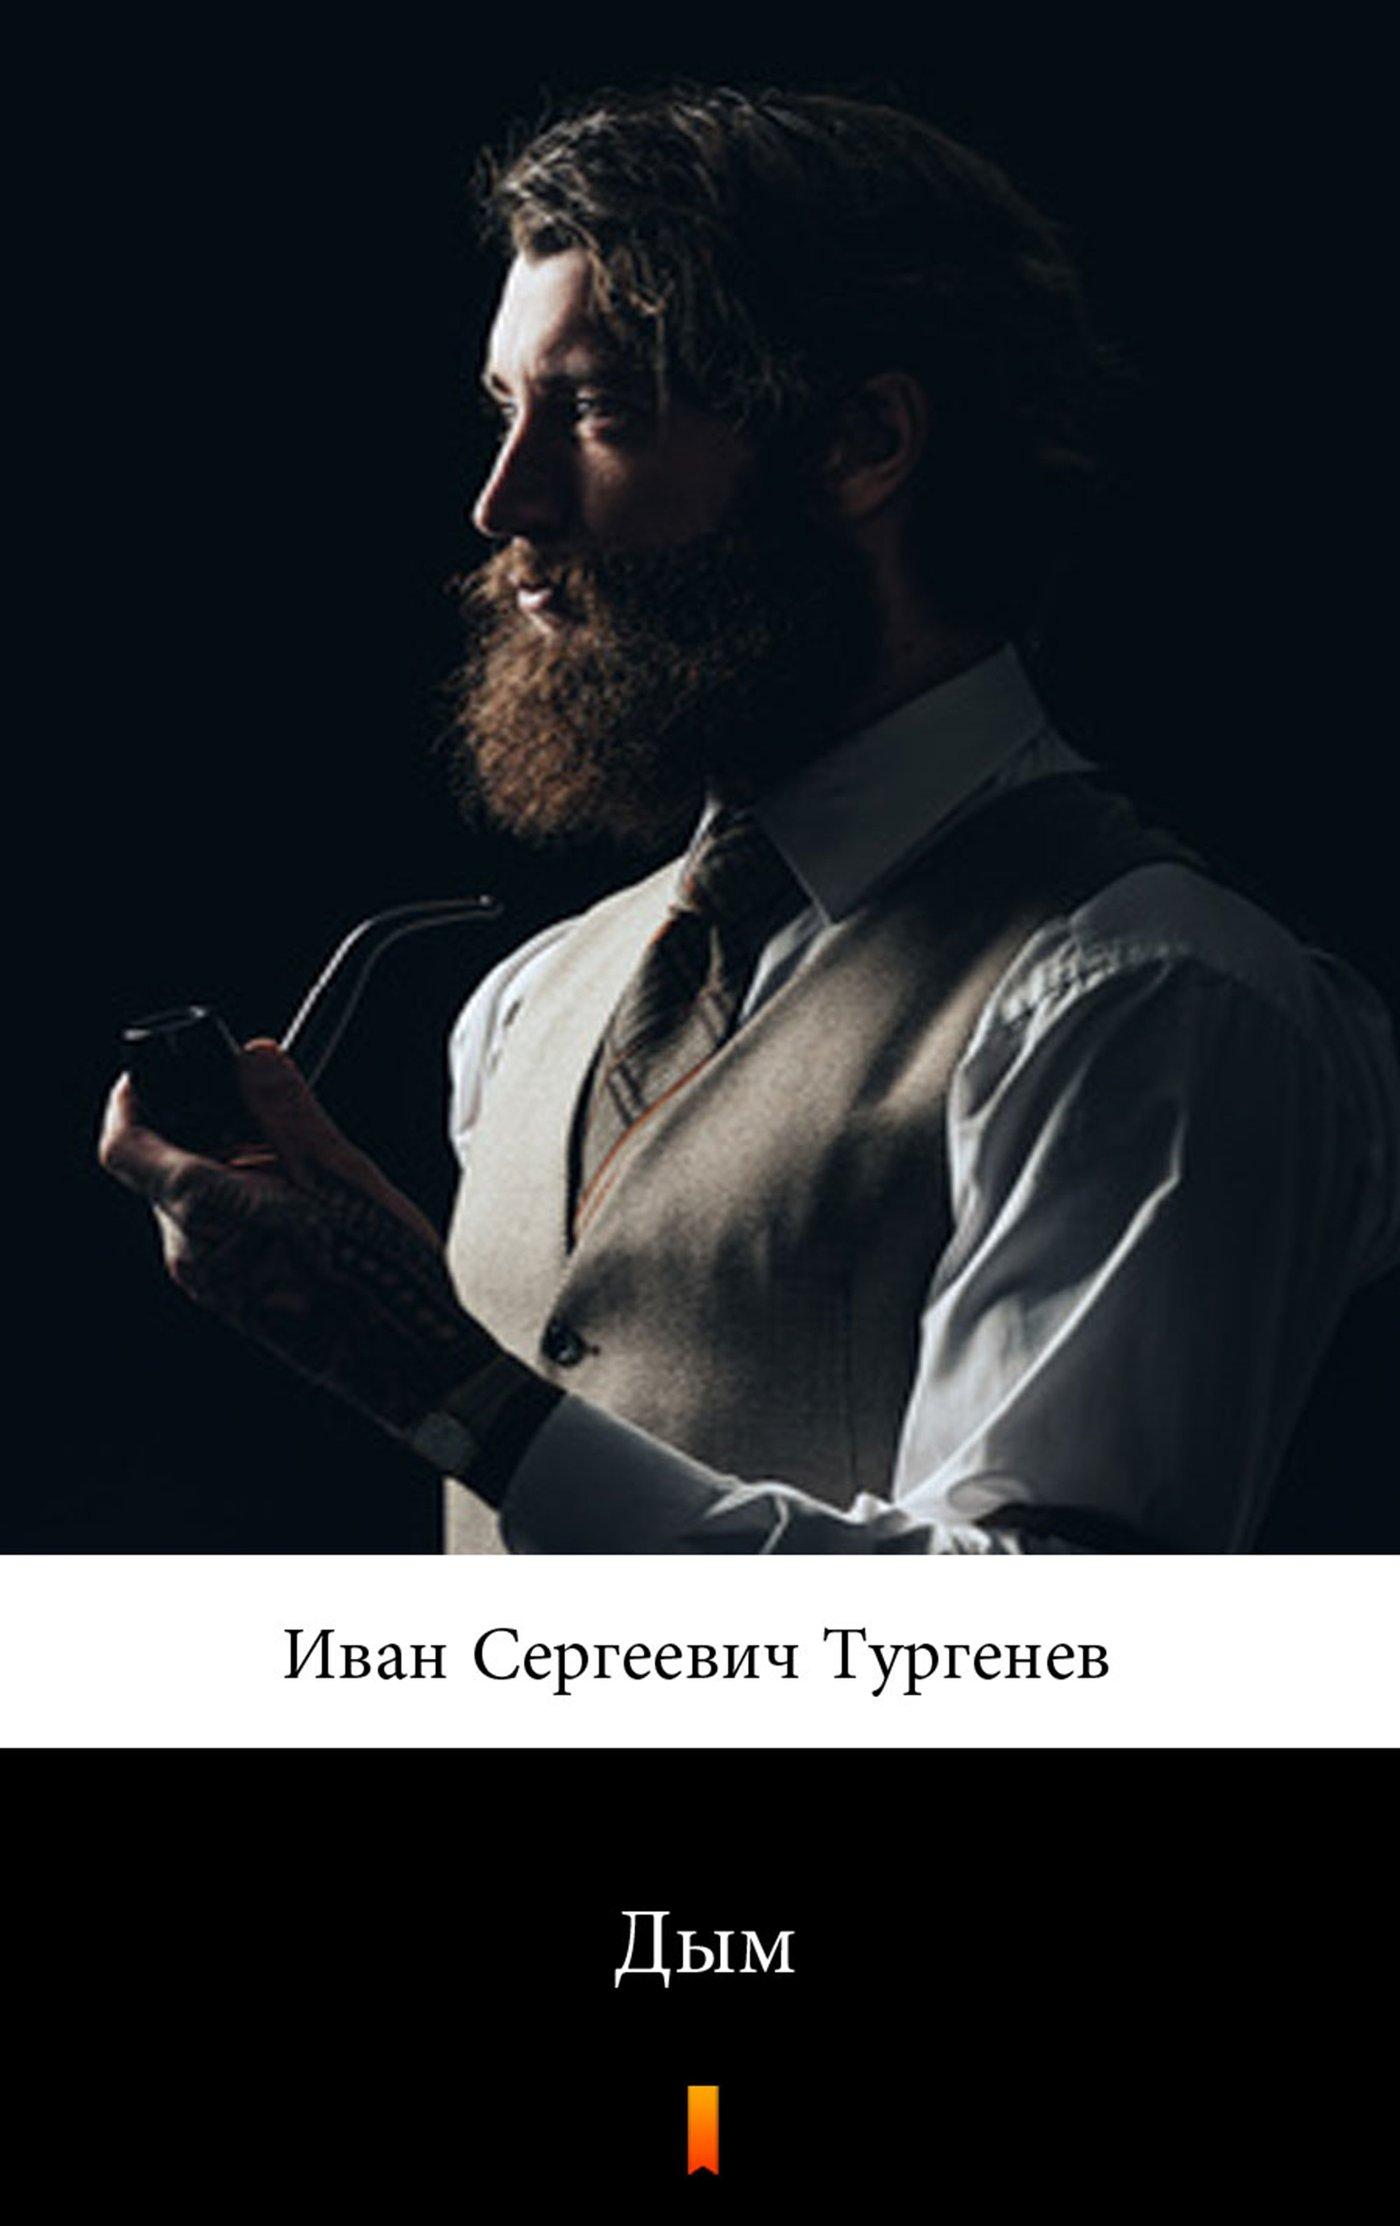 Дым - Ebook (Książka na Kindle) do pobrania w formacie MOBI